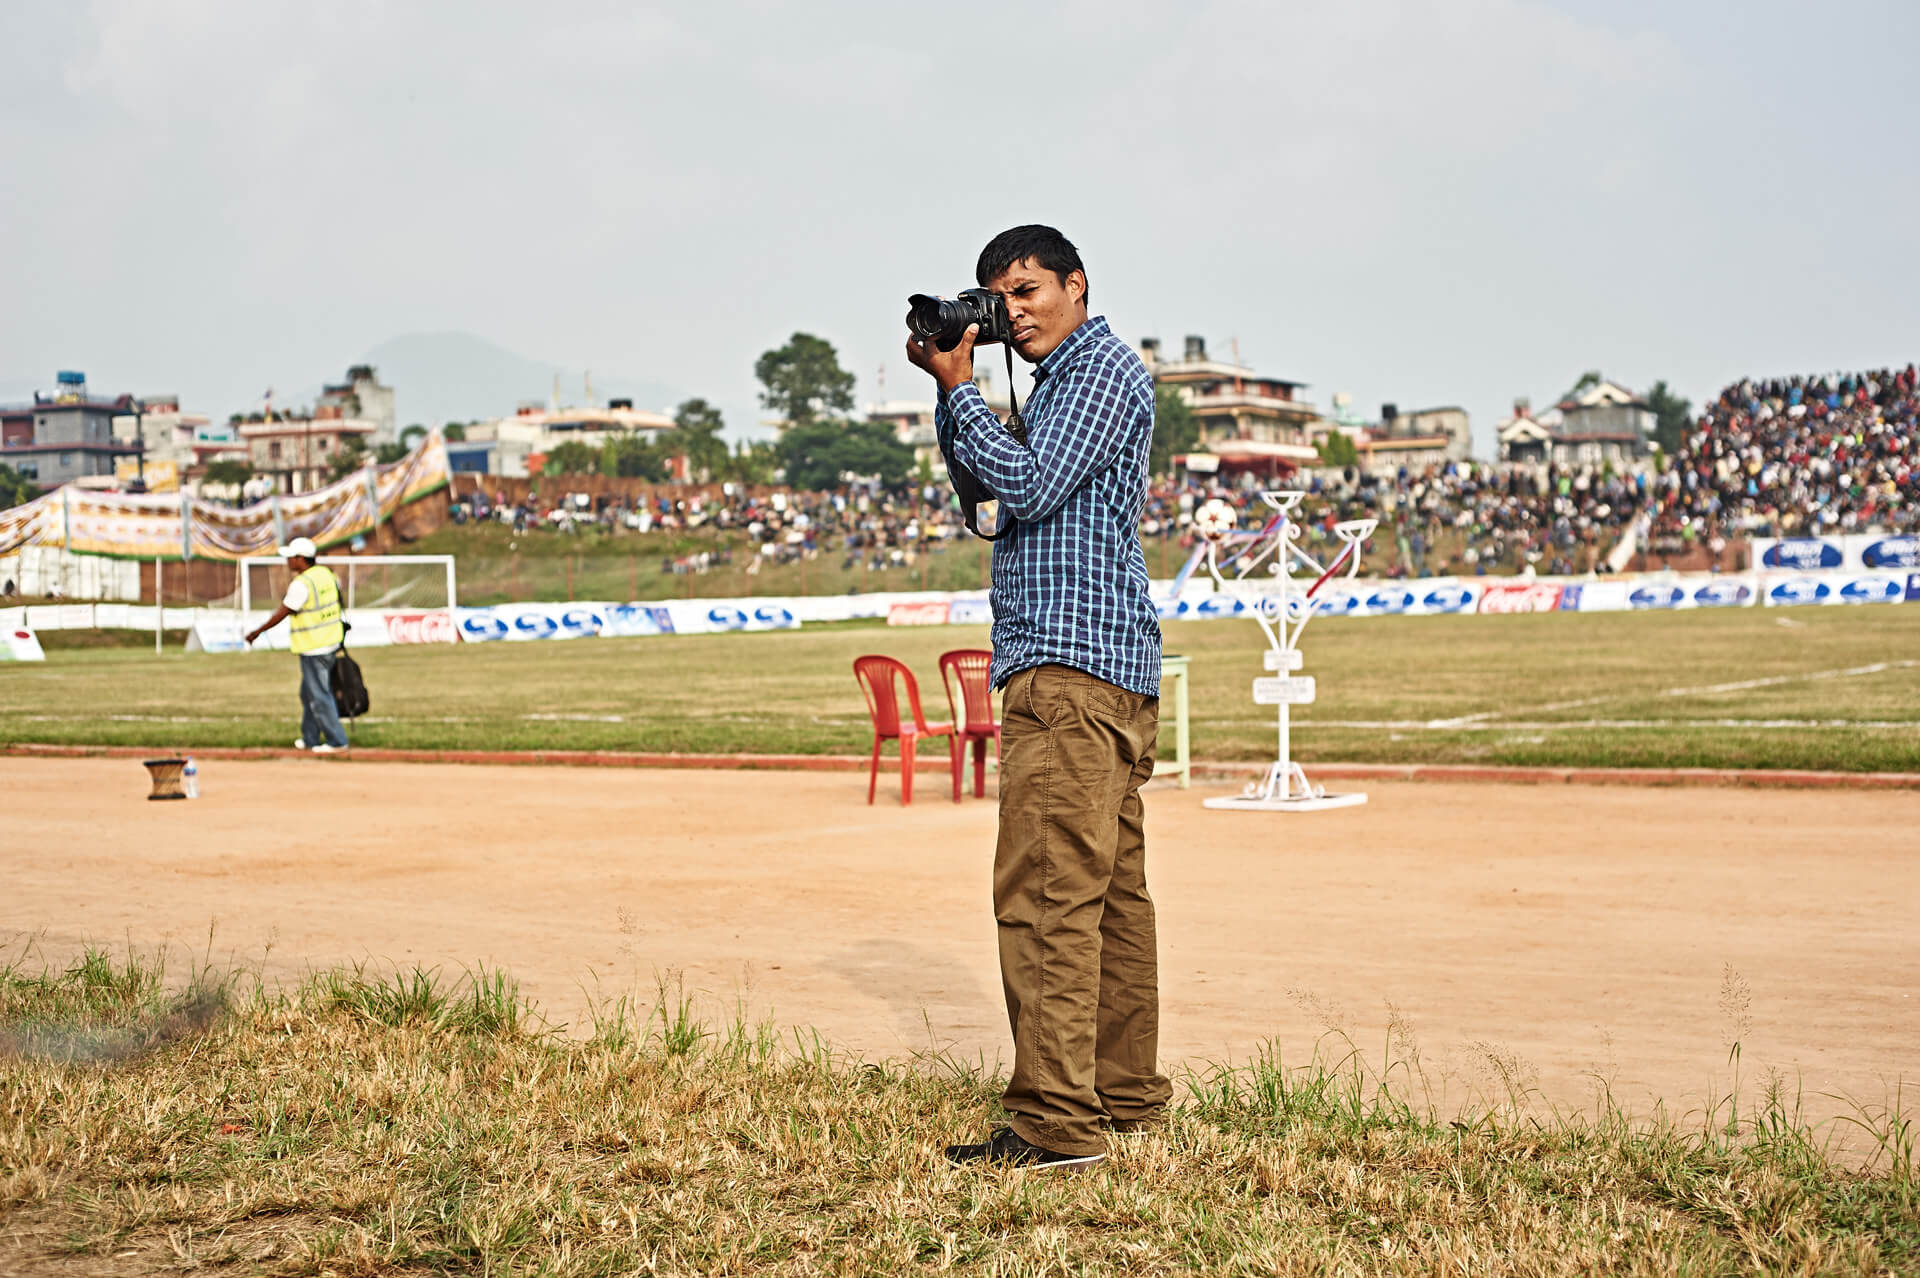 nepal_pokhara_20131030_0162-Kopie